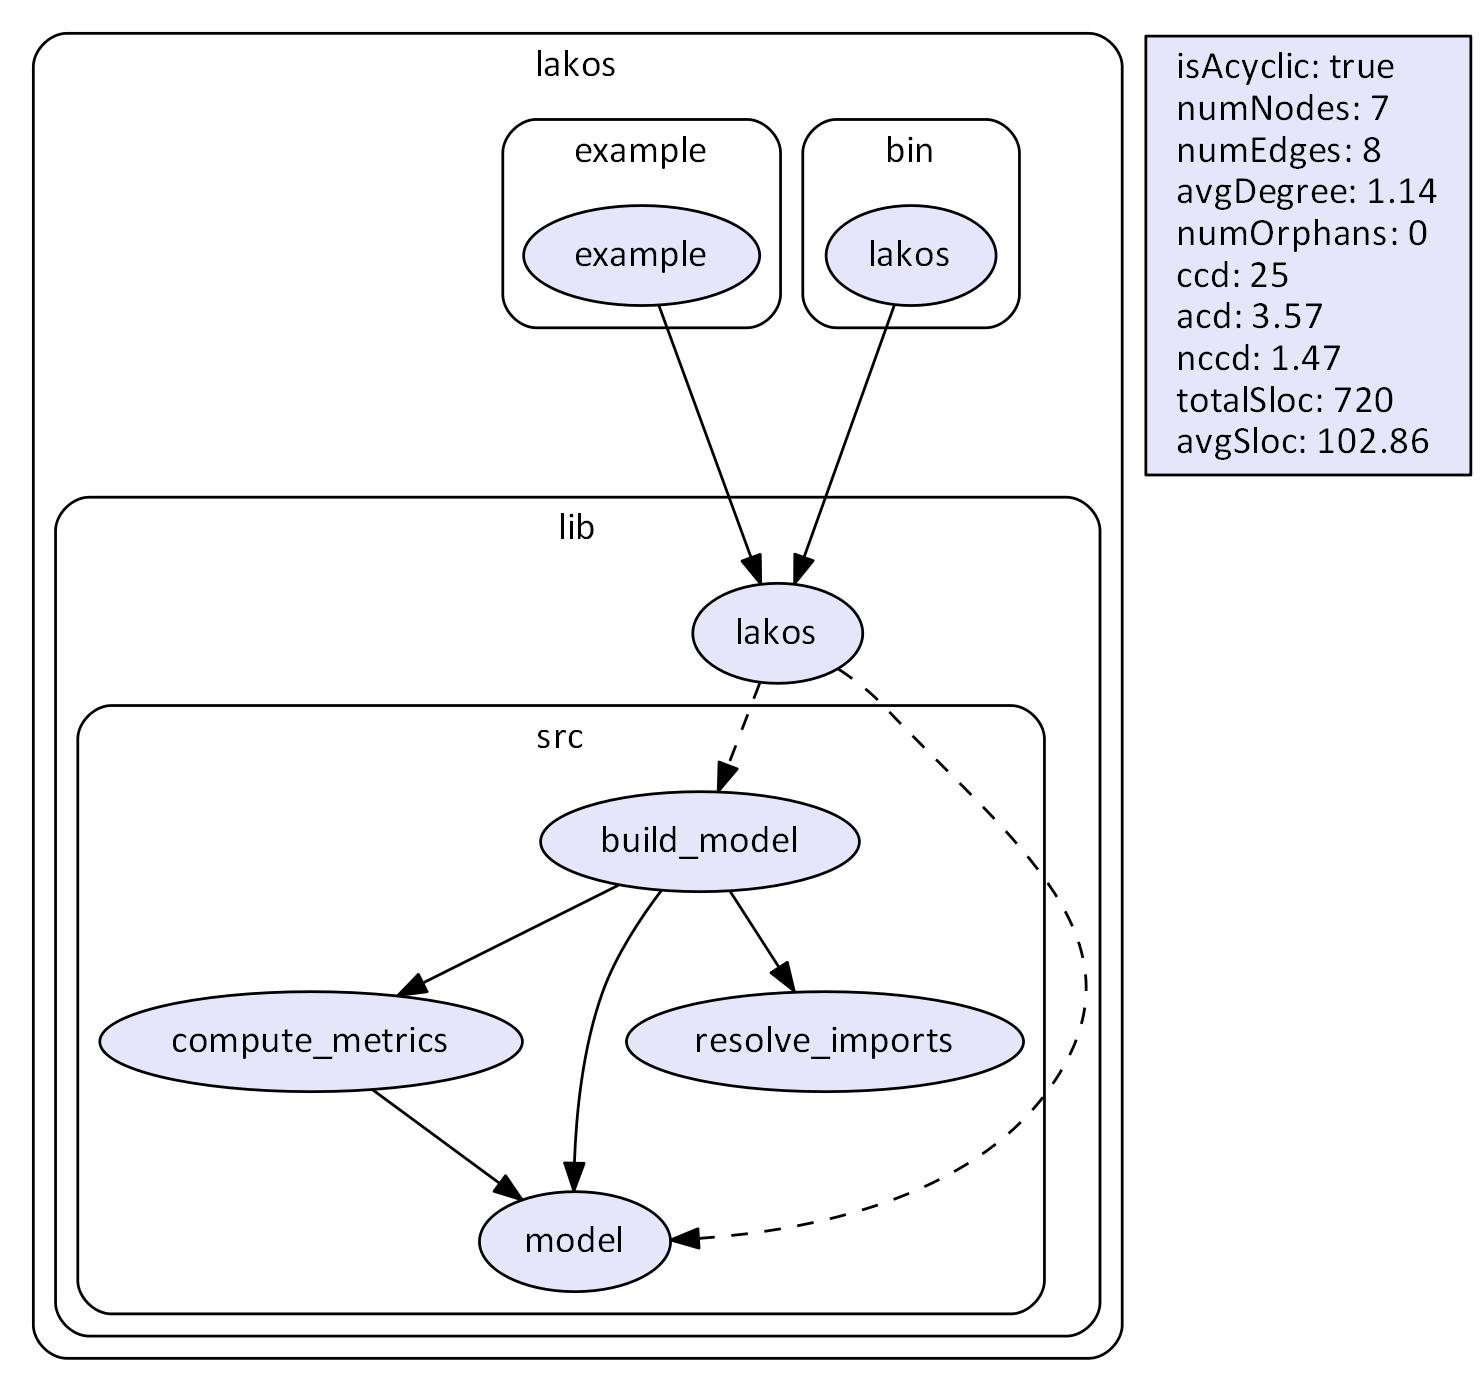 Lakos run on itself with metrics, ignoring tests.